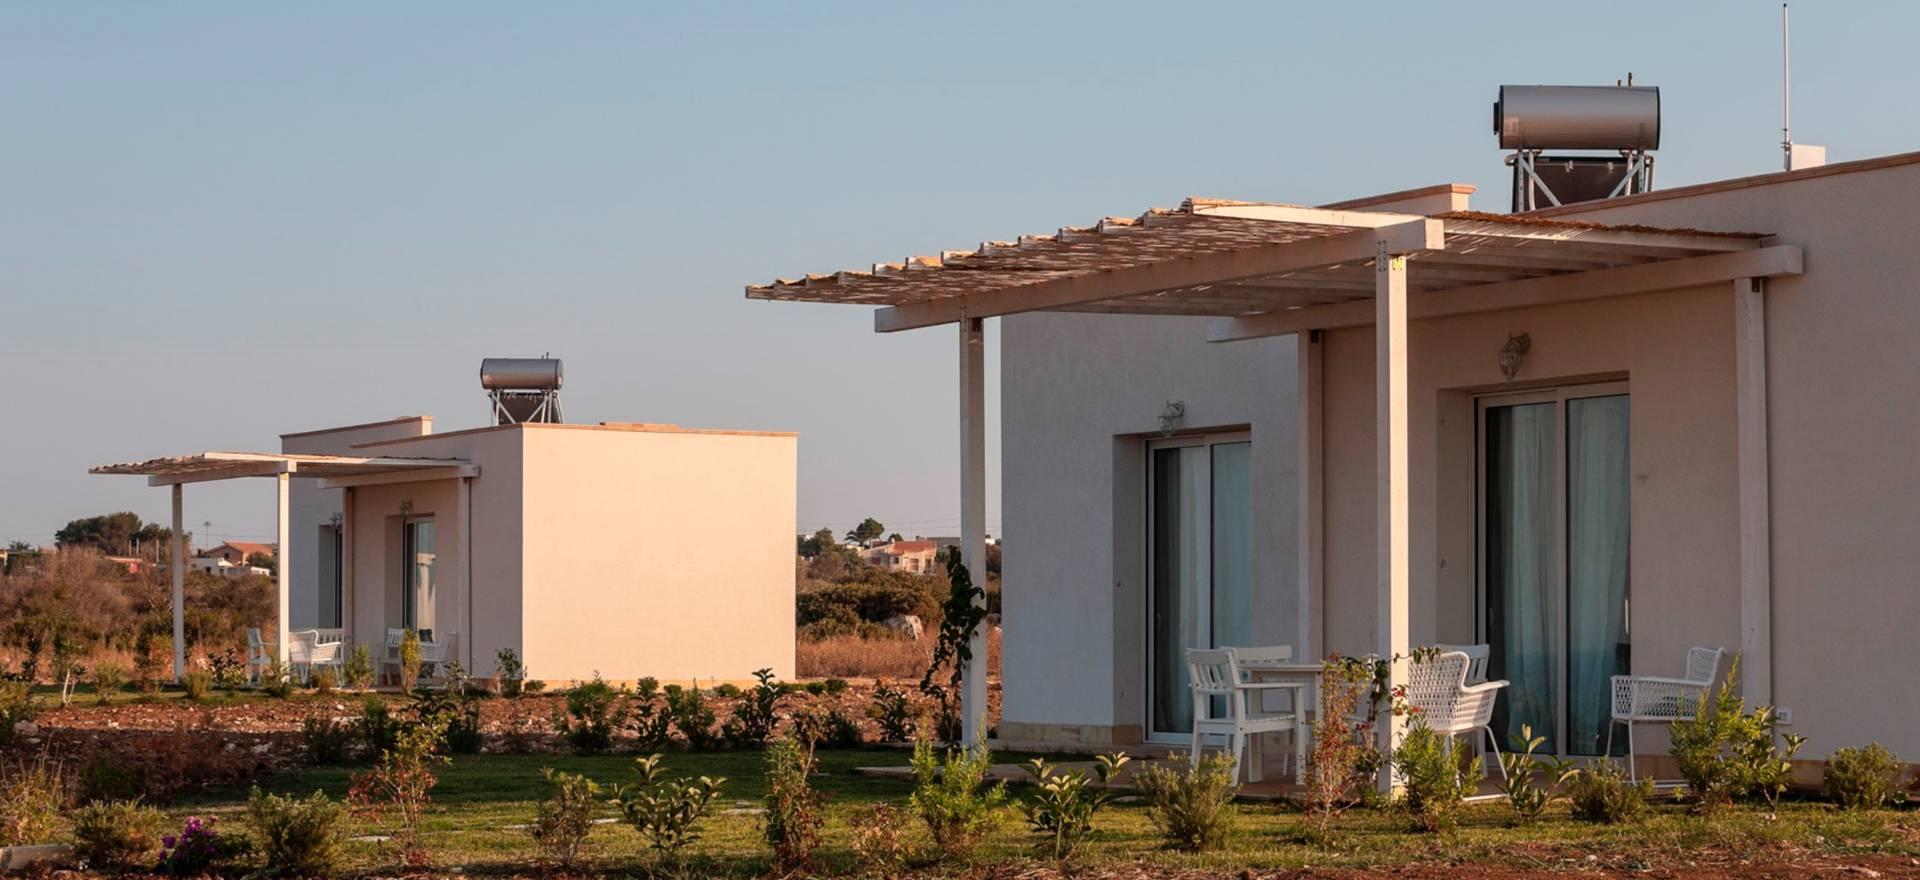 Agriturismo Sicilie Cottages op prachtige plek aan zee vlakbij Siracusa